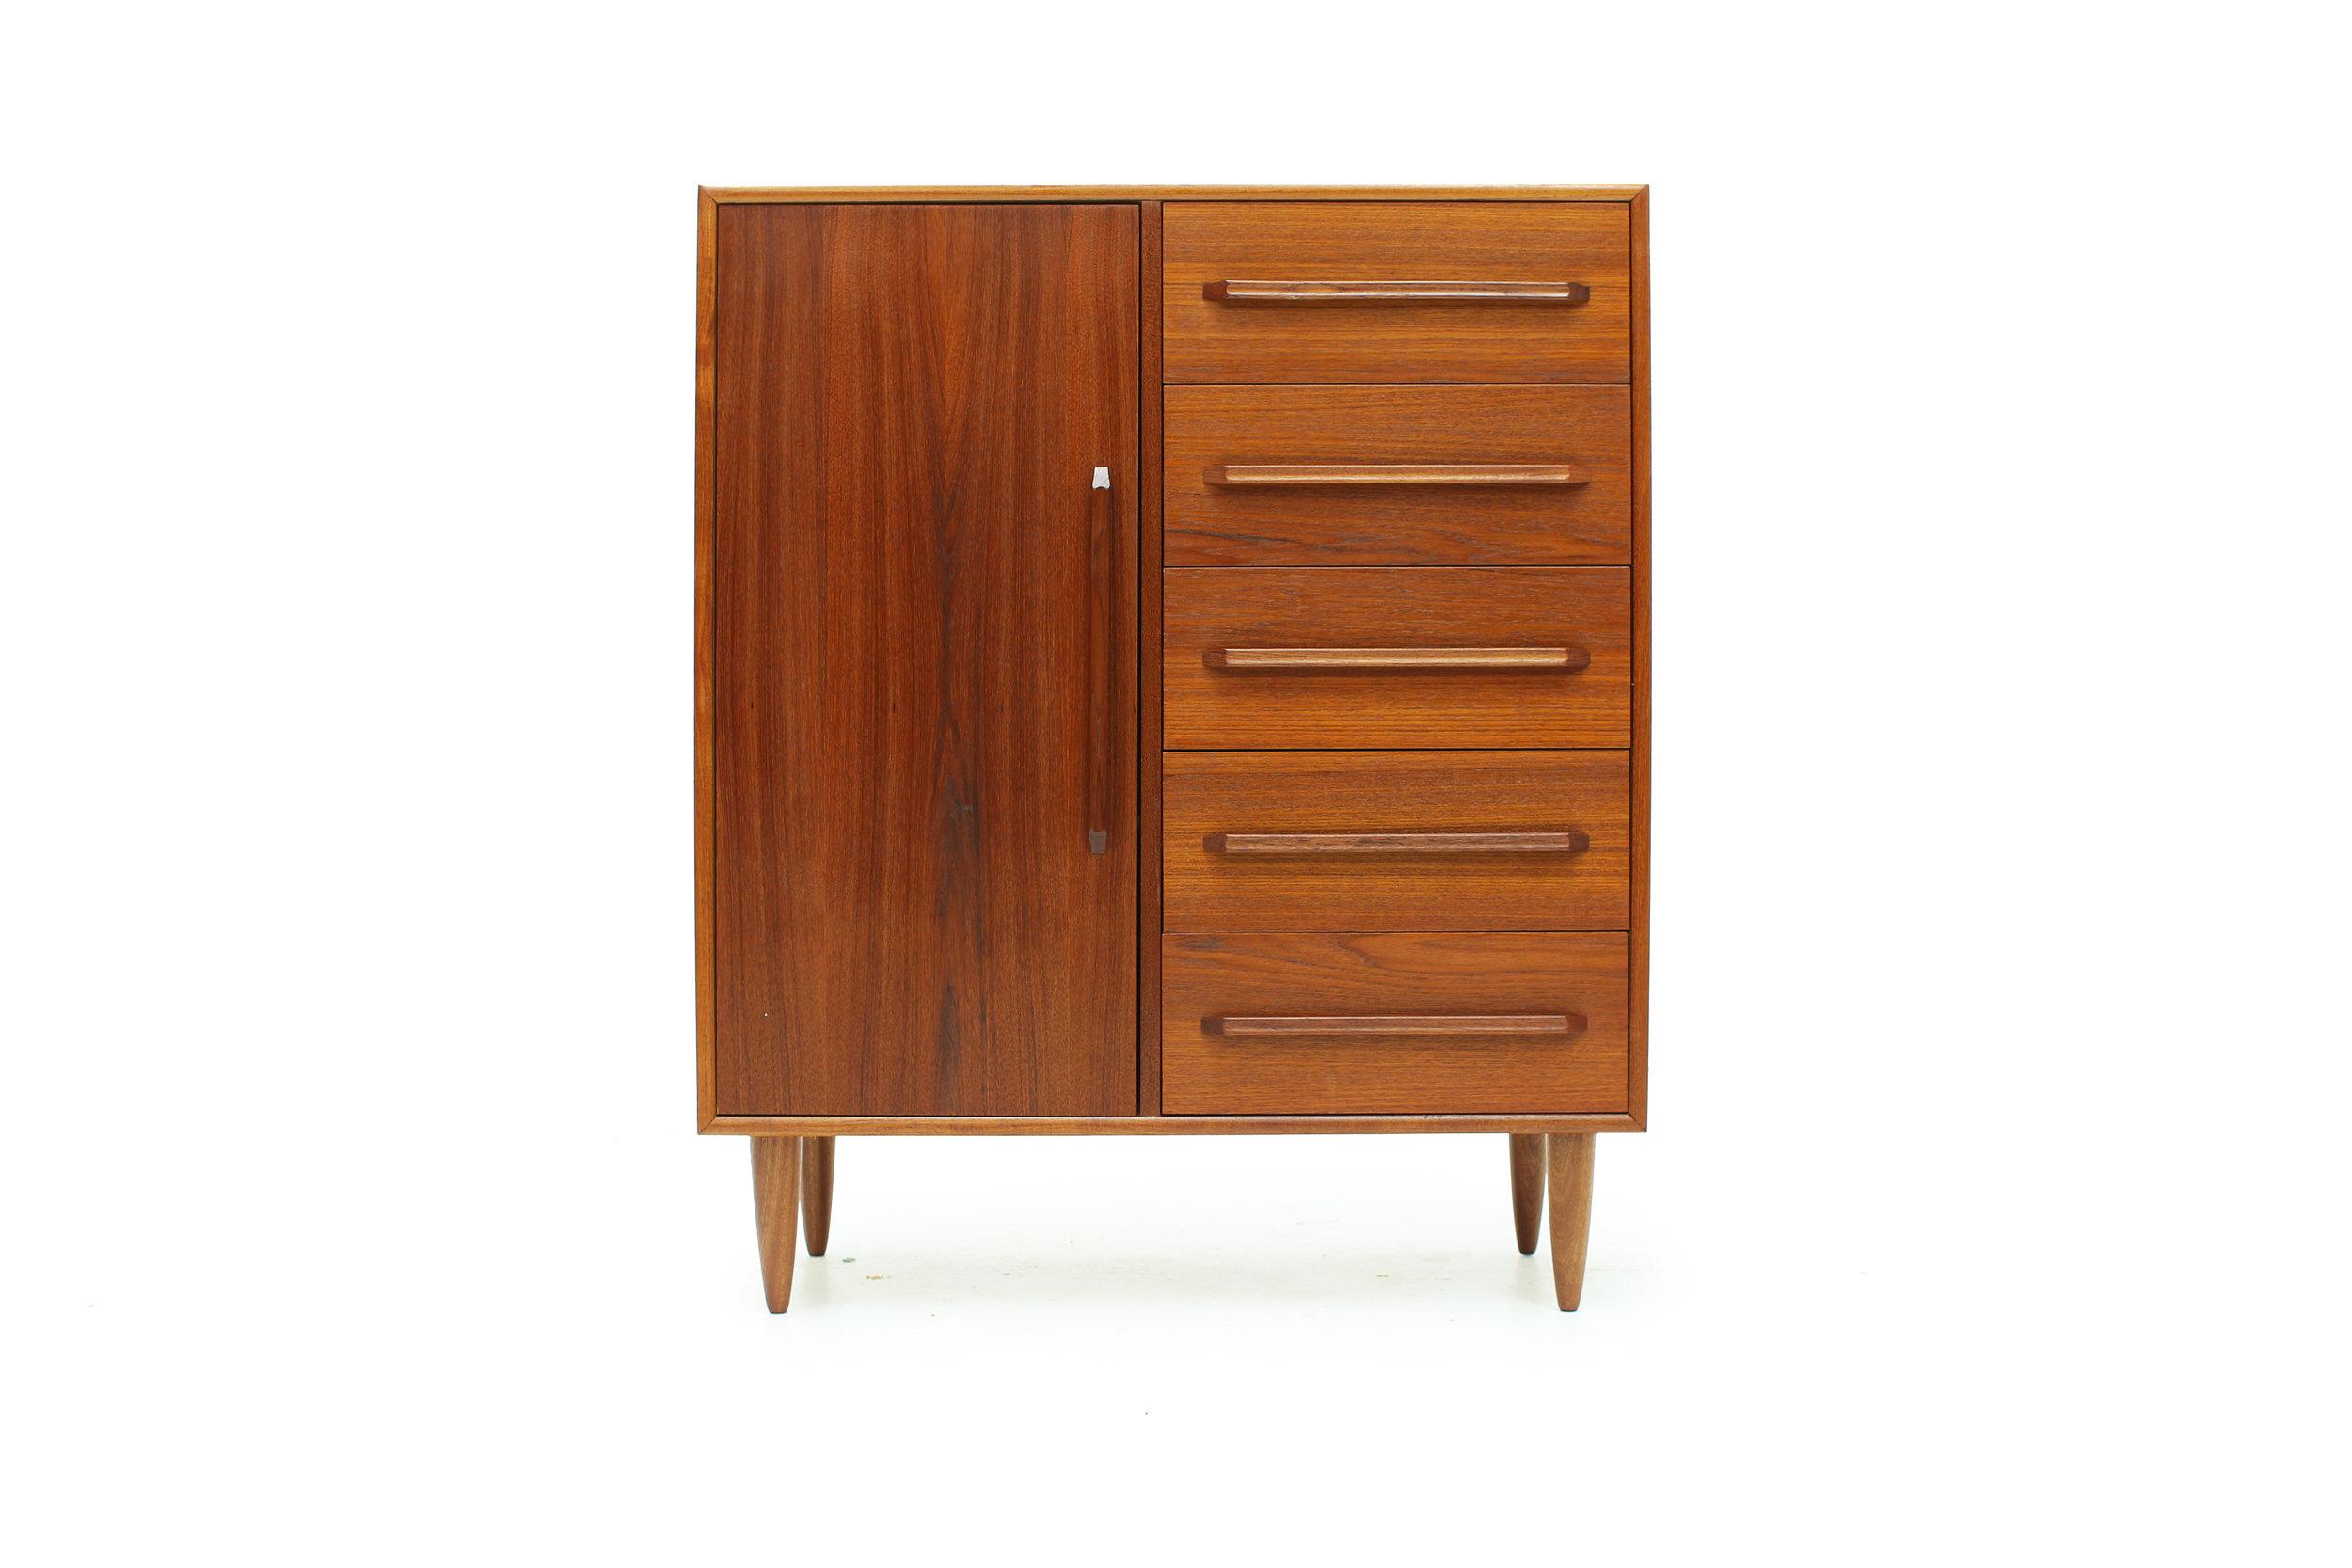 MCM Teakwood Gentleman's Chest Dresser (1).jpg